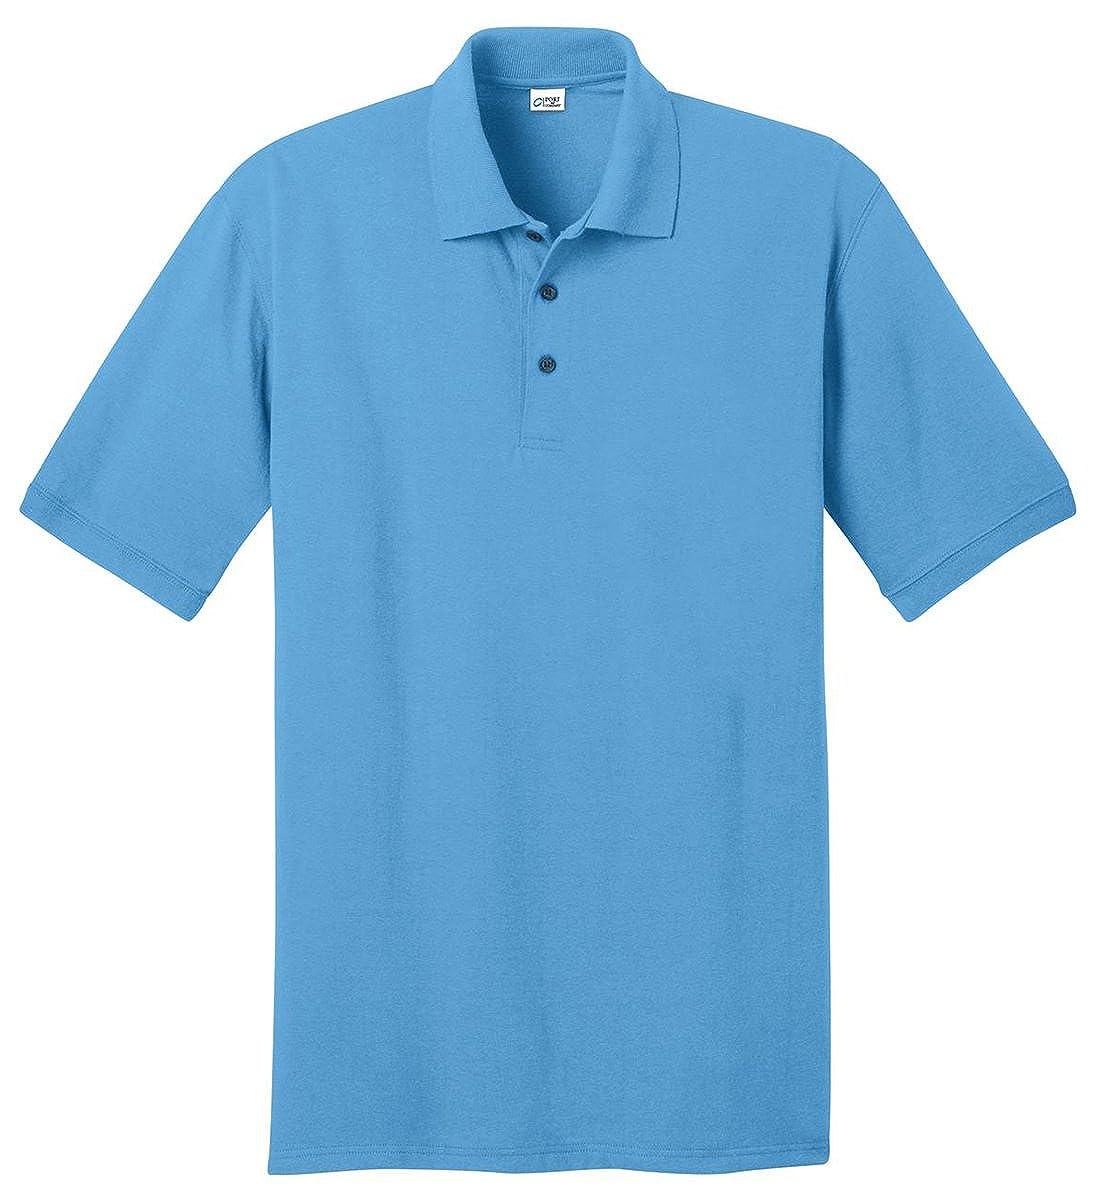 Port /& Company Mens Durable Perfect Pique Polo Shirt/_Aquatic Blue/_XXXX-Large